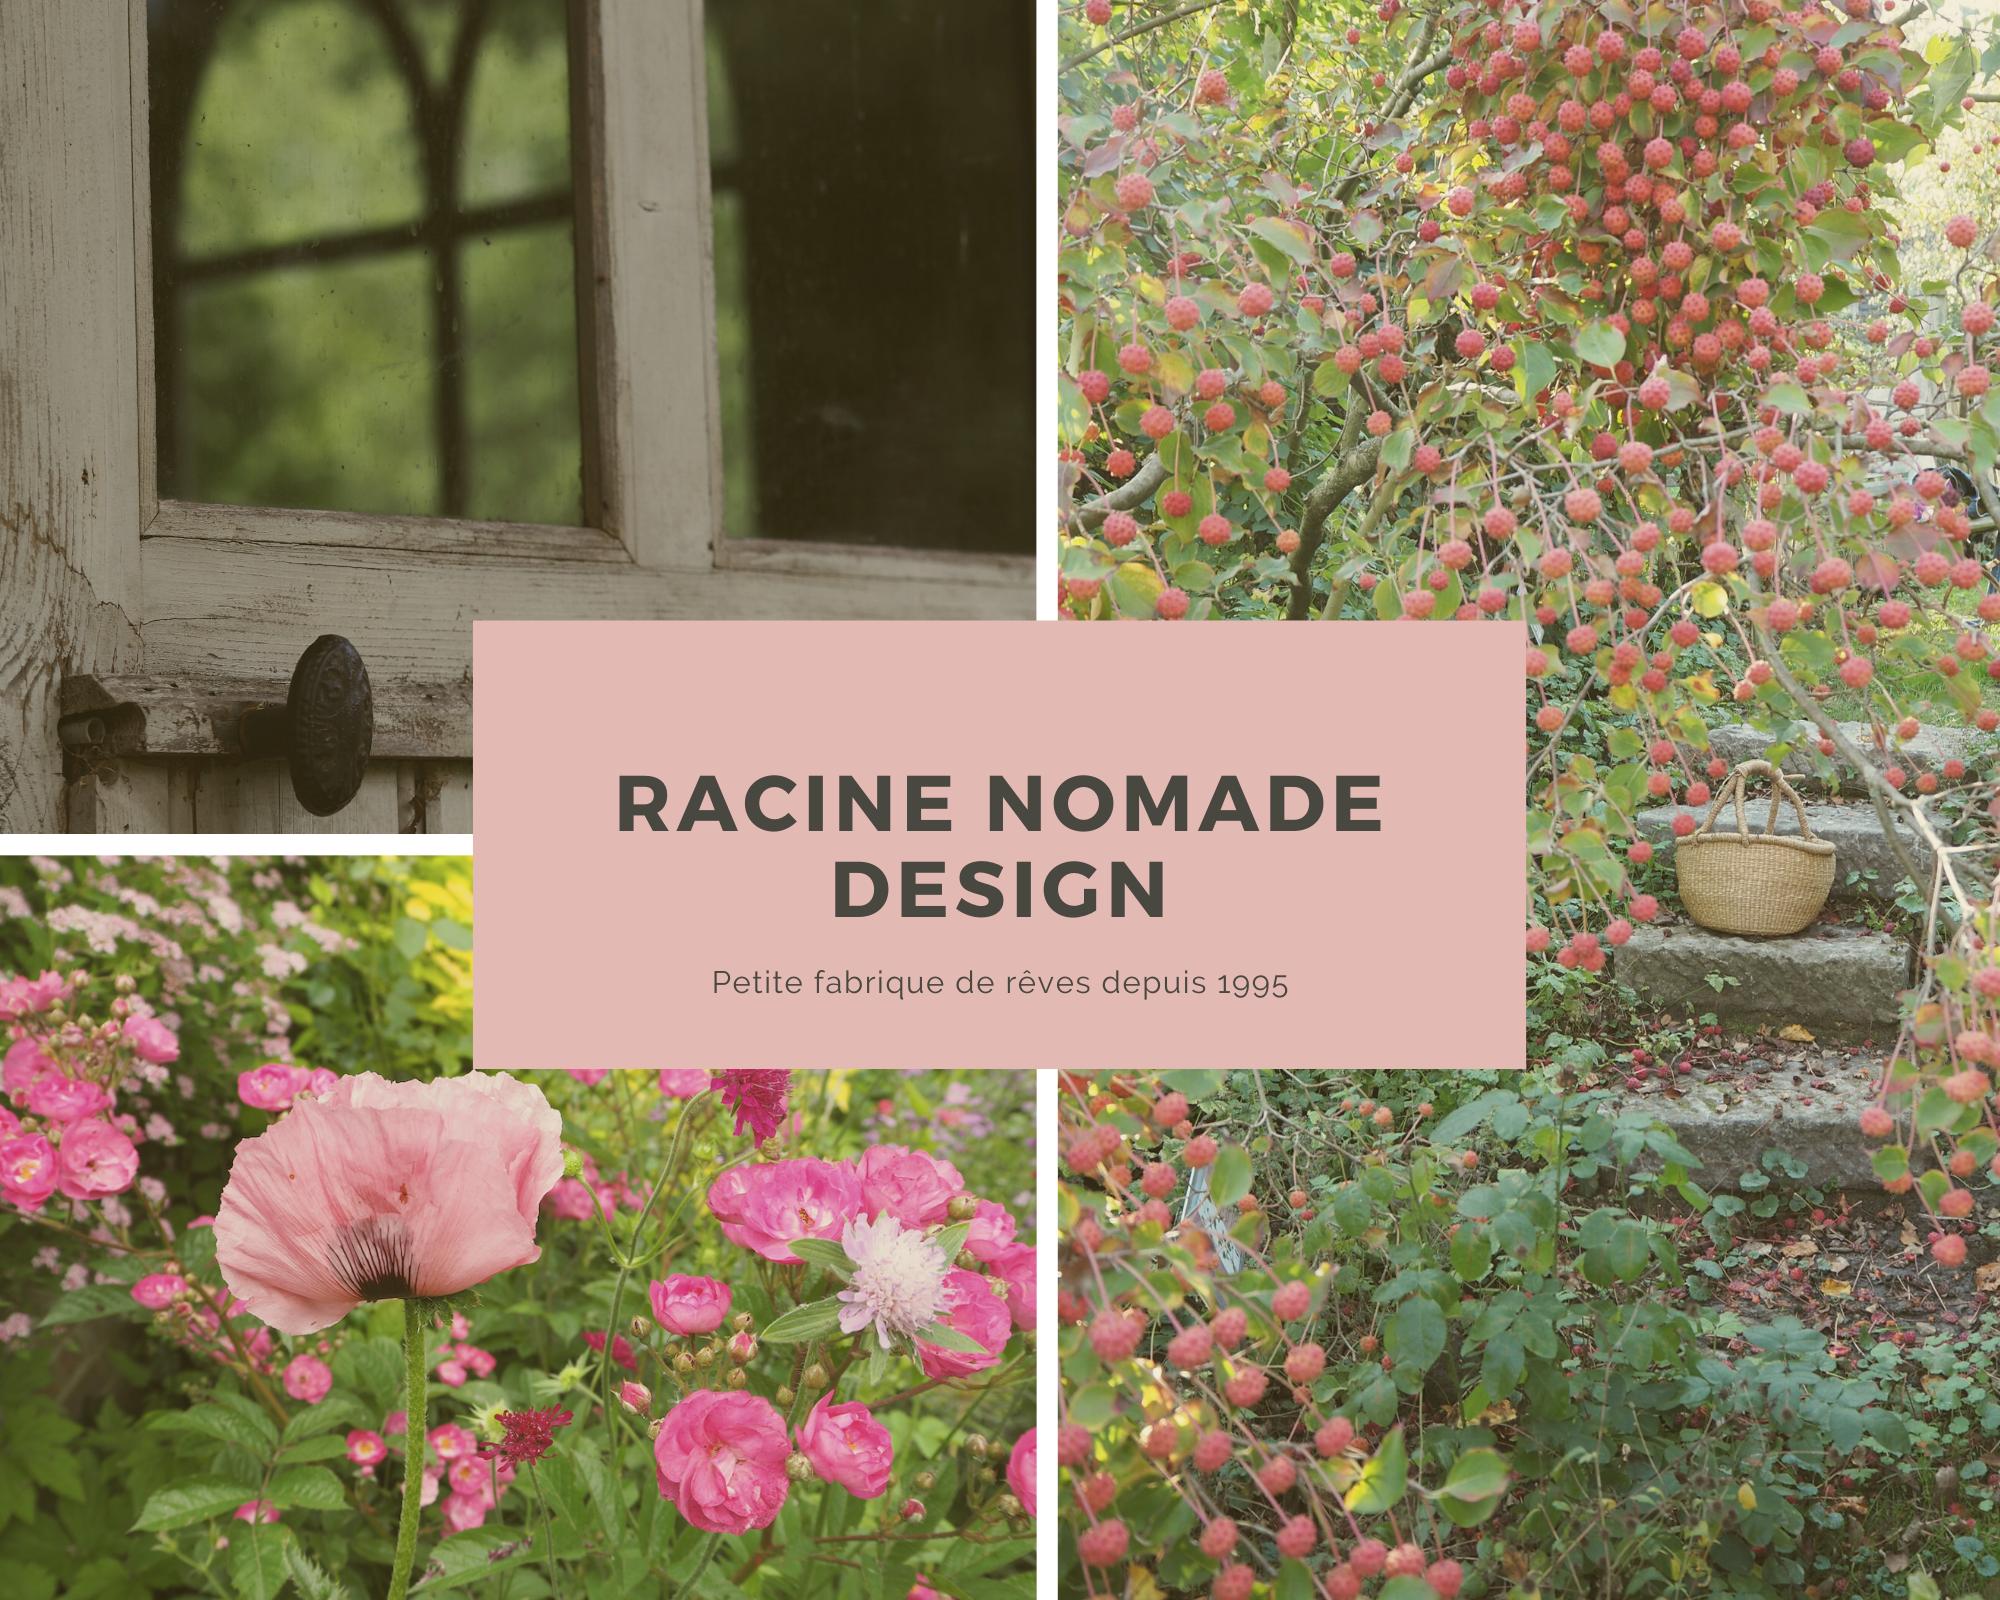 RACINE NOMADE Design